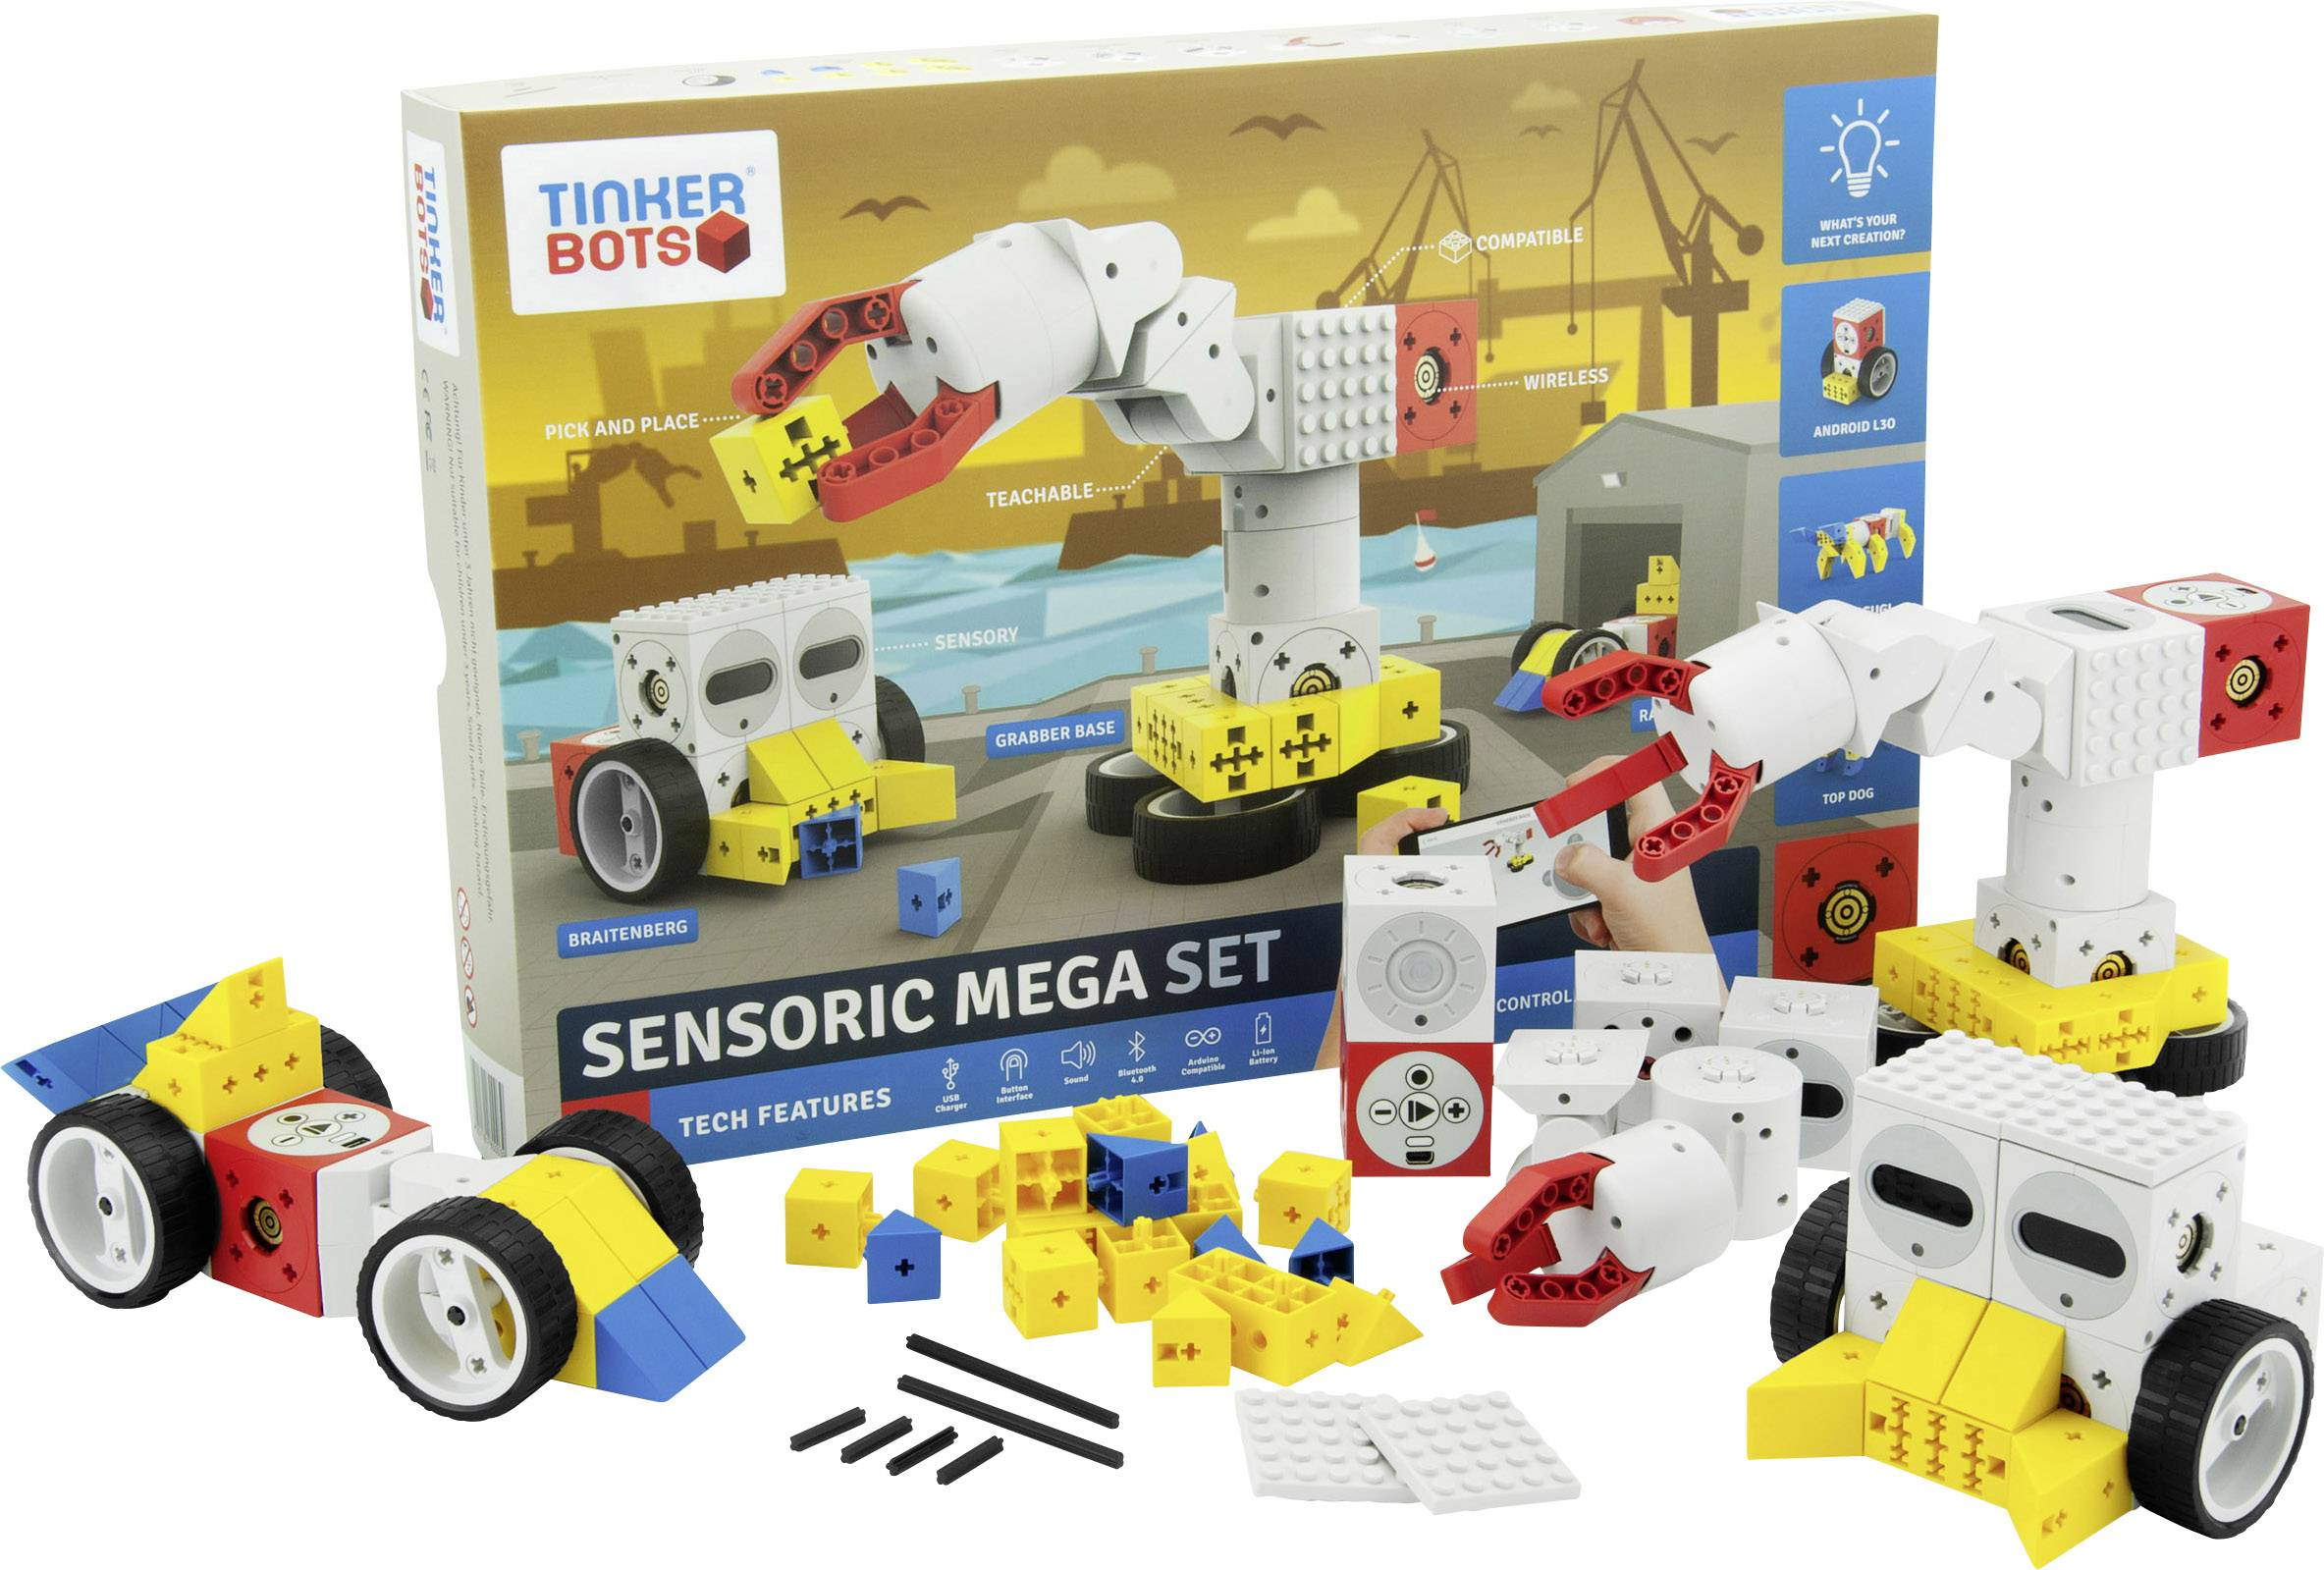 TINKERBOTS Roboter Bausatz Mega Robotics Set kompatibel mit LEGO und anderen Bausteinen